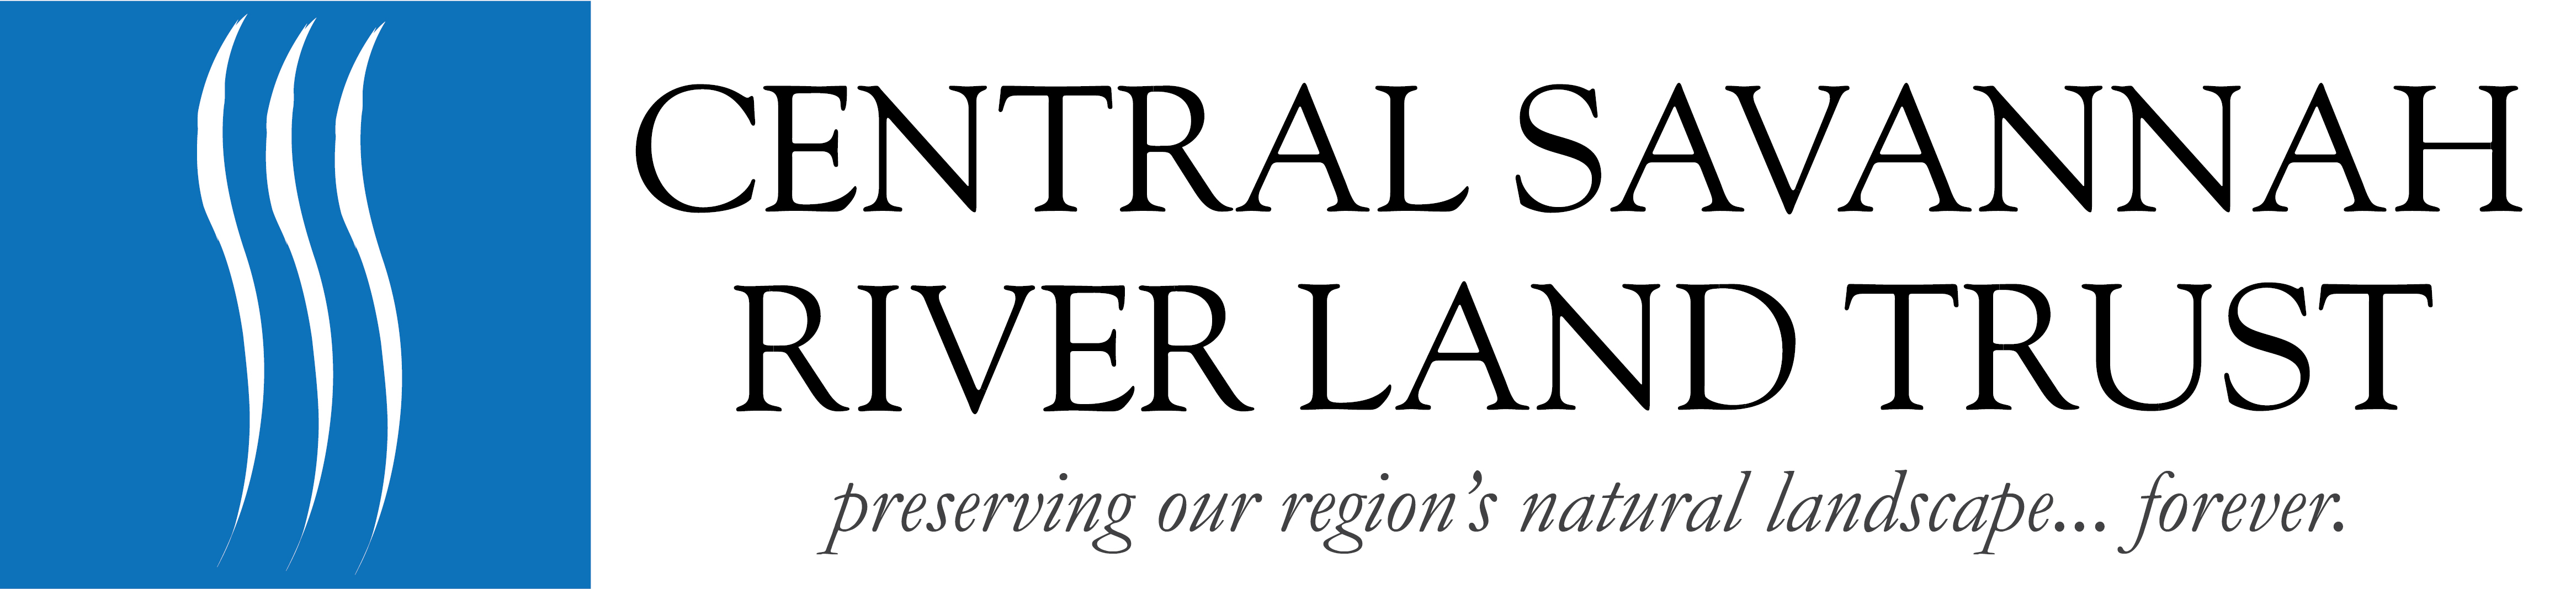 The Central Savannah River Land Trust